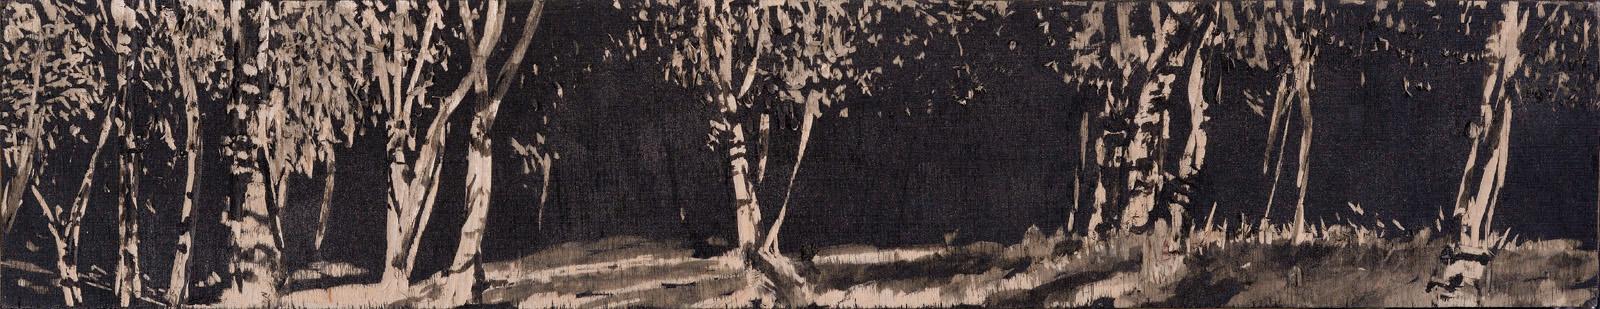 """Sonnenbirken"" 2014, 42x8cm, Acryl auf Holz, Holzschnitt"